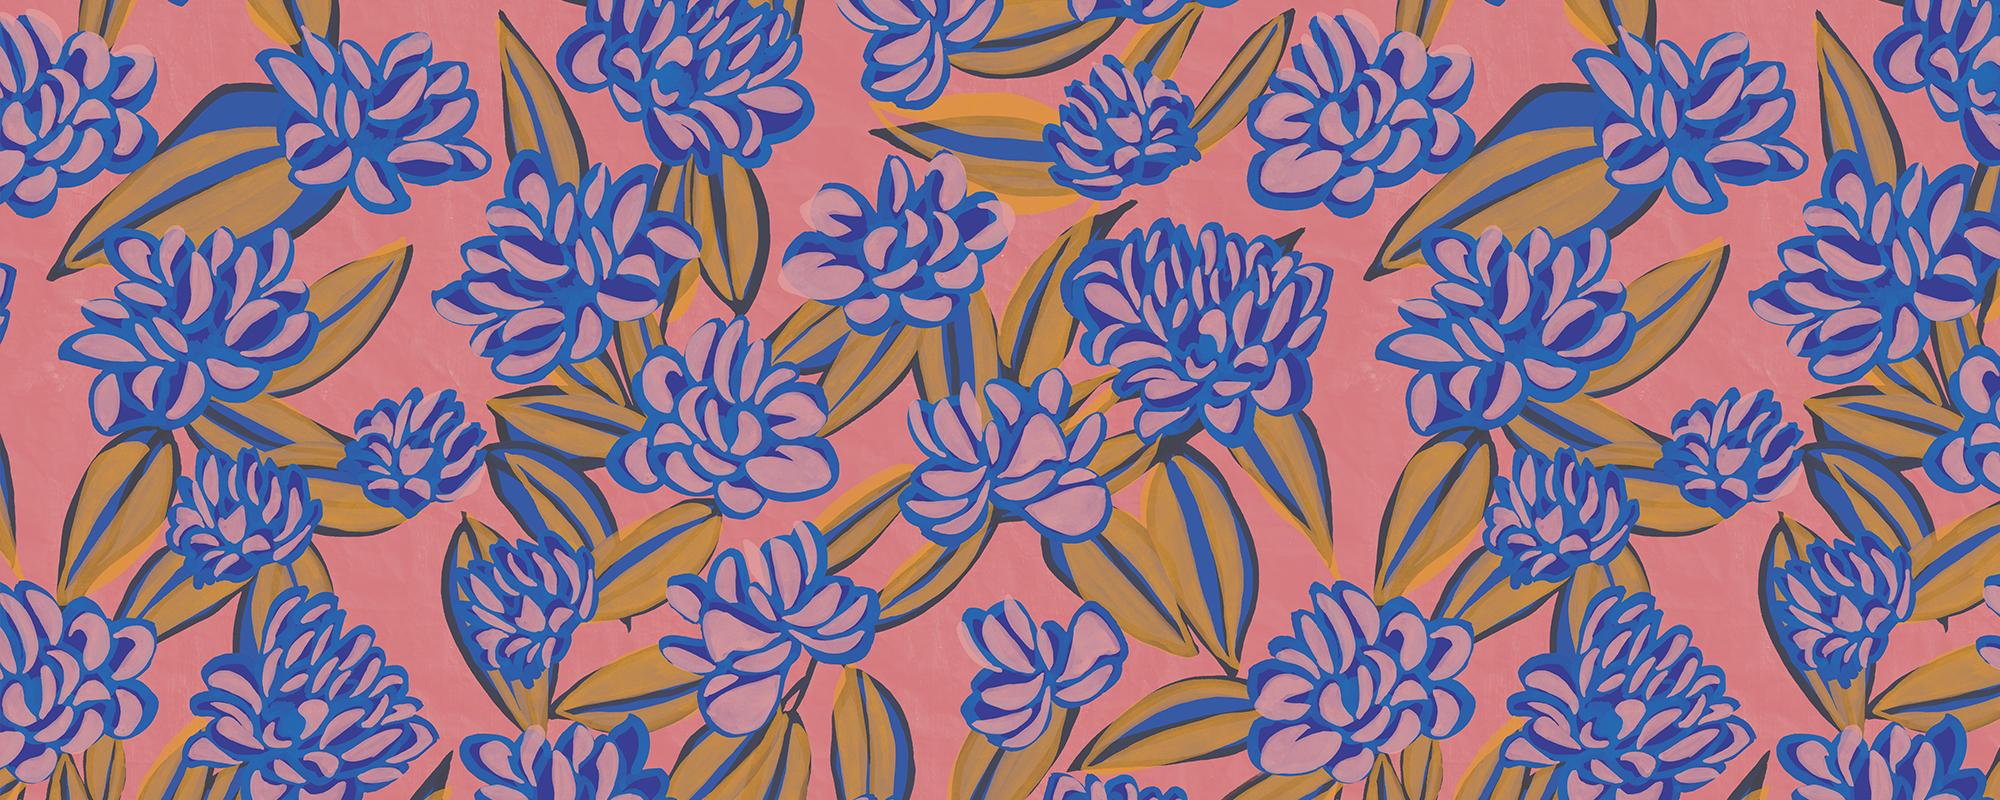 Papier peint moif fleurs fuschia